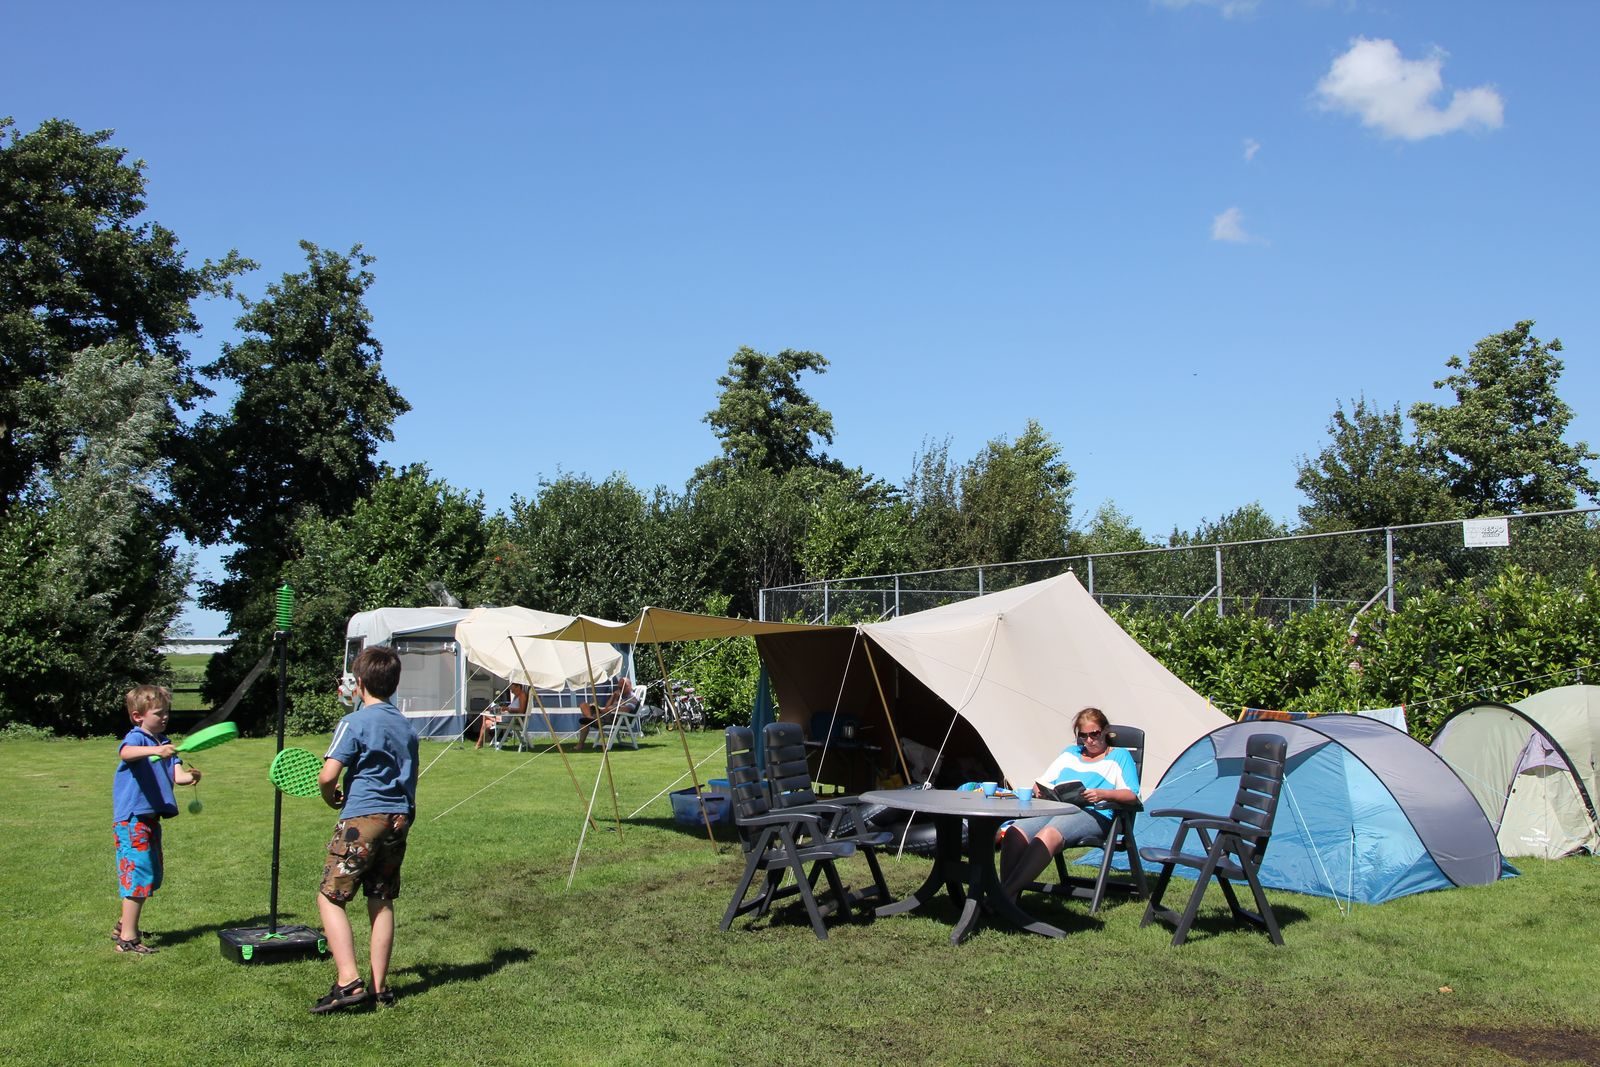 Afbeelding van Kampeerplaats Camper, Caravan of Tent, 6A